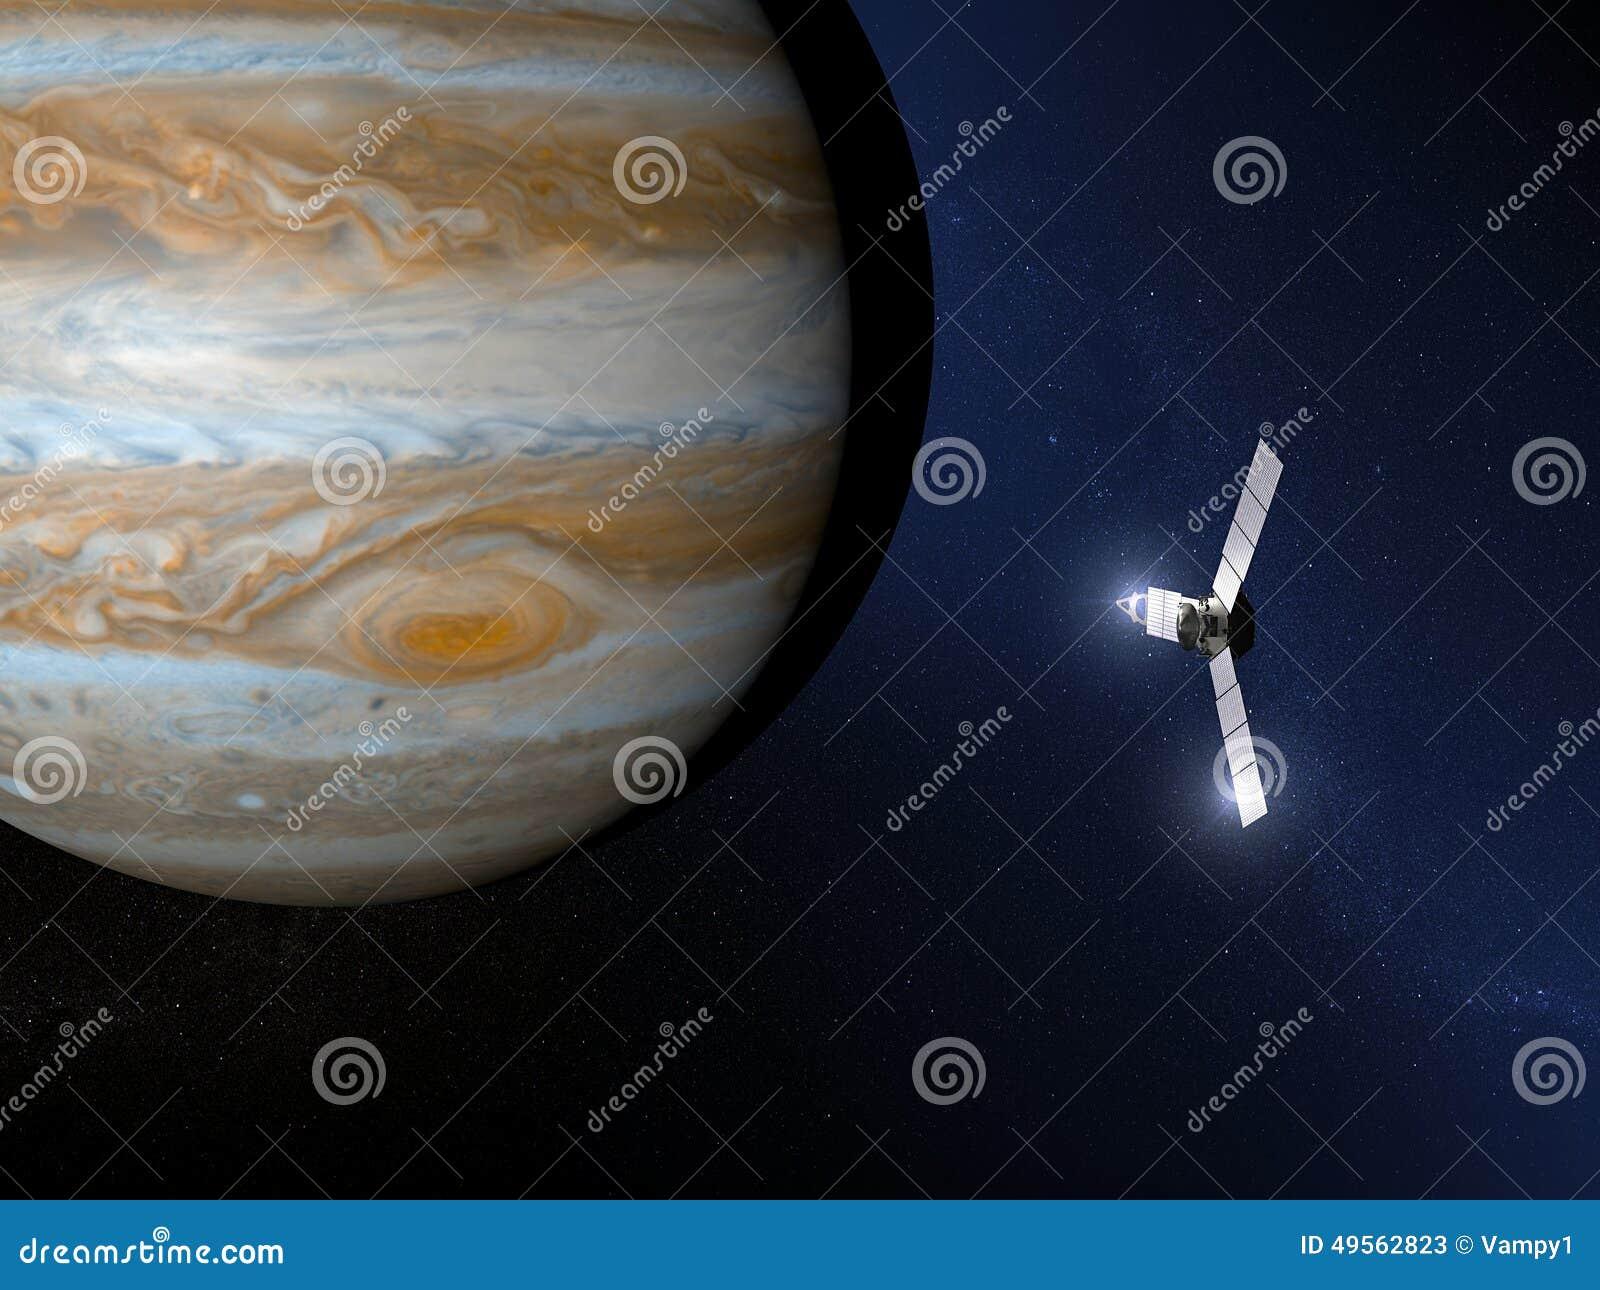 Jupiter And Juno Space Probe Stock Illustration Image